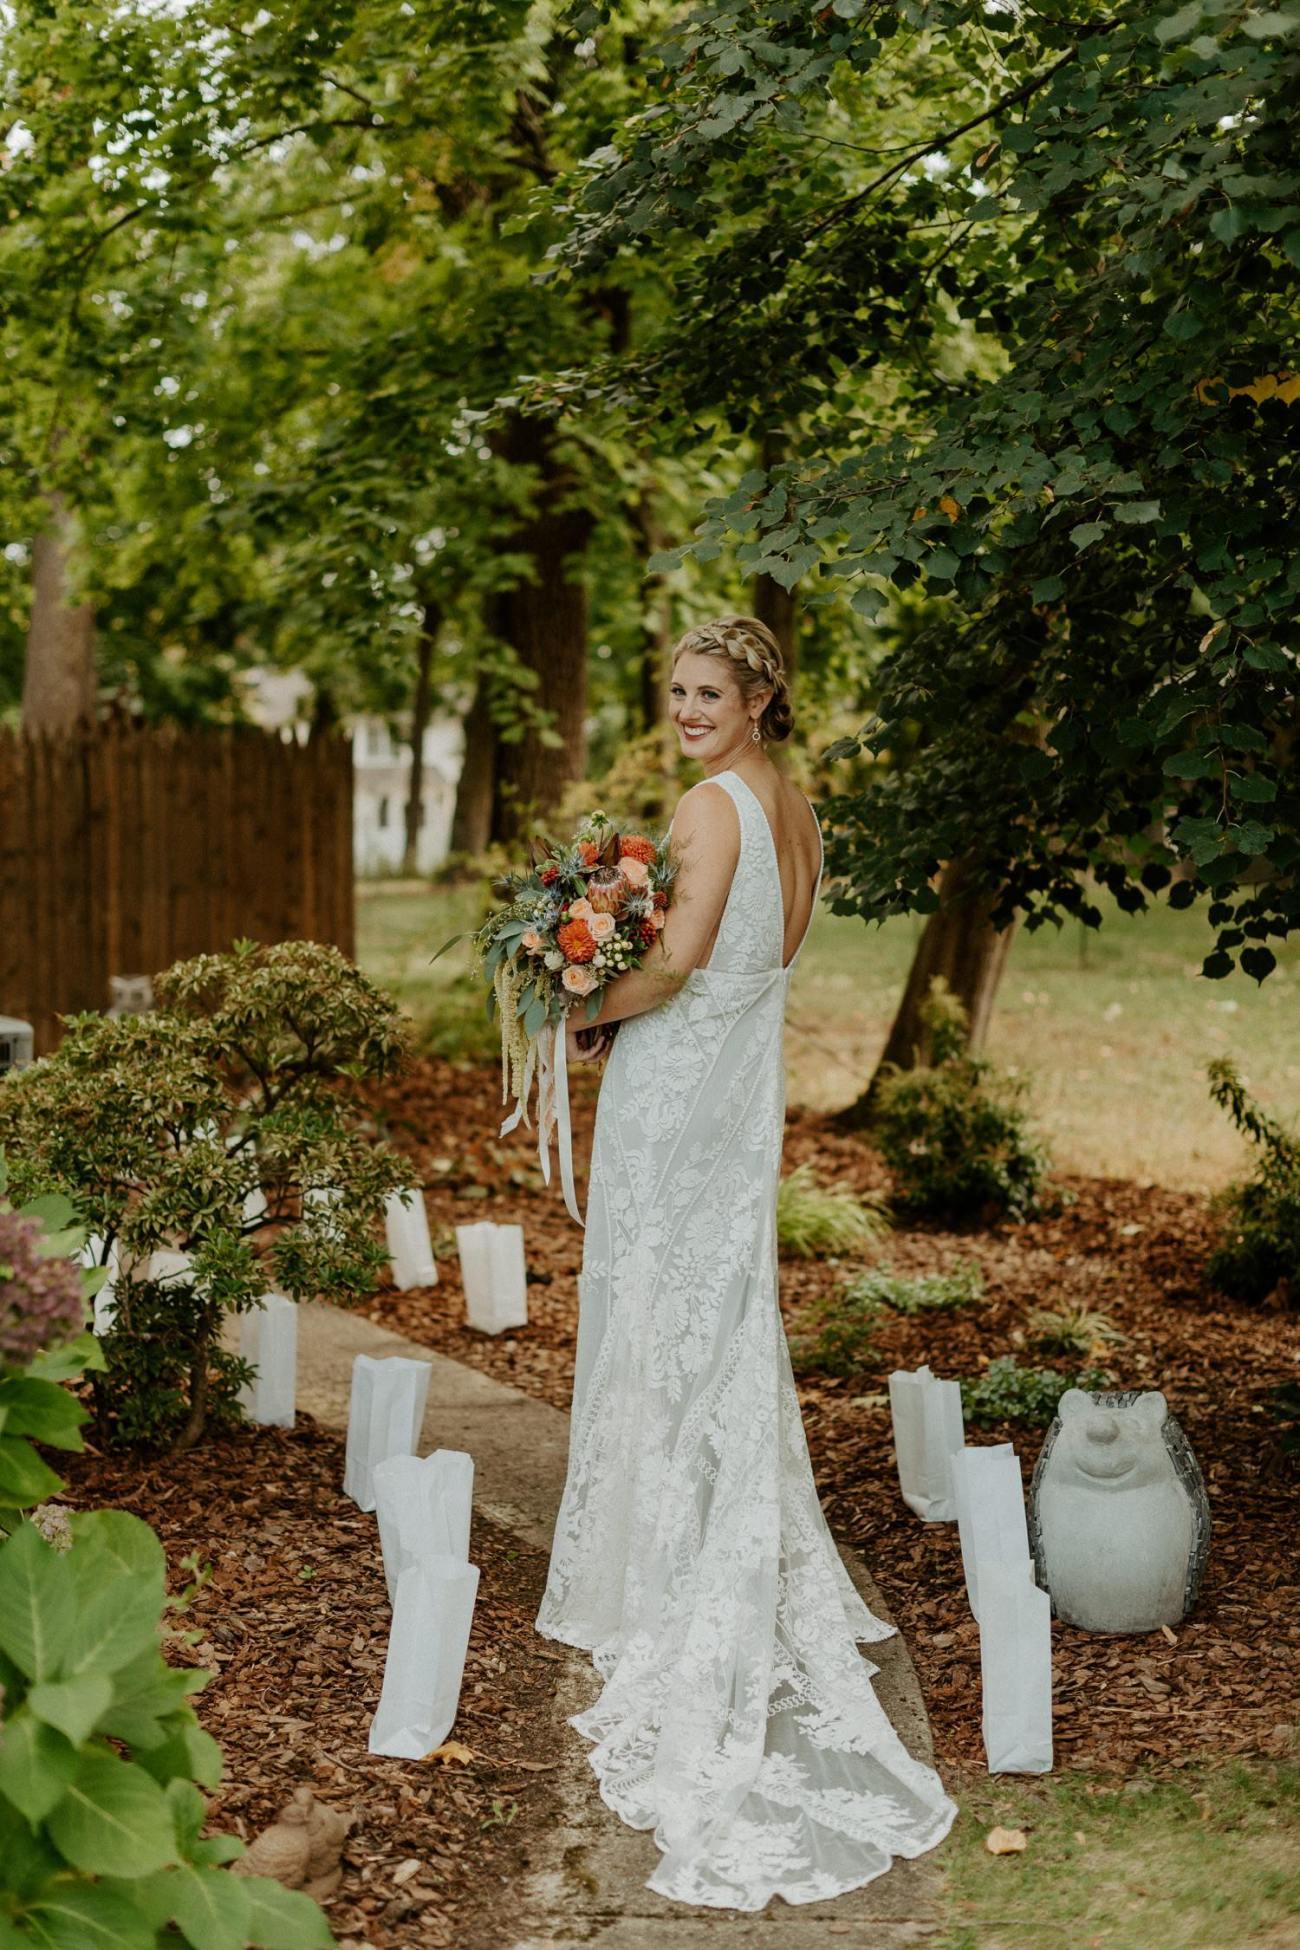 New Jersey Fall Backyard Wedding Bend Wedding Photographer NJ Wedding Photographer Anais Possamai Photography 015